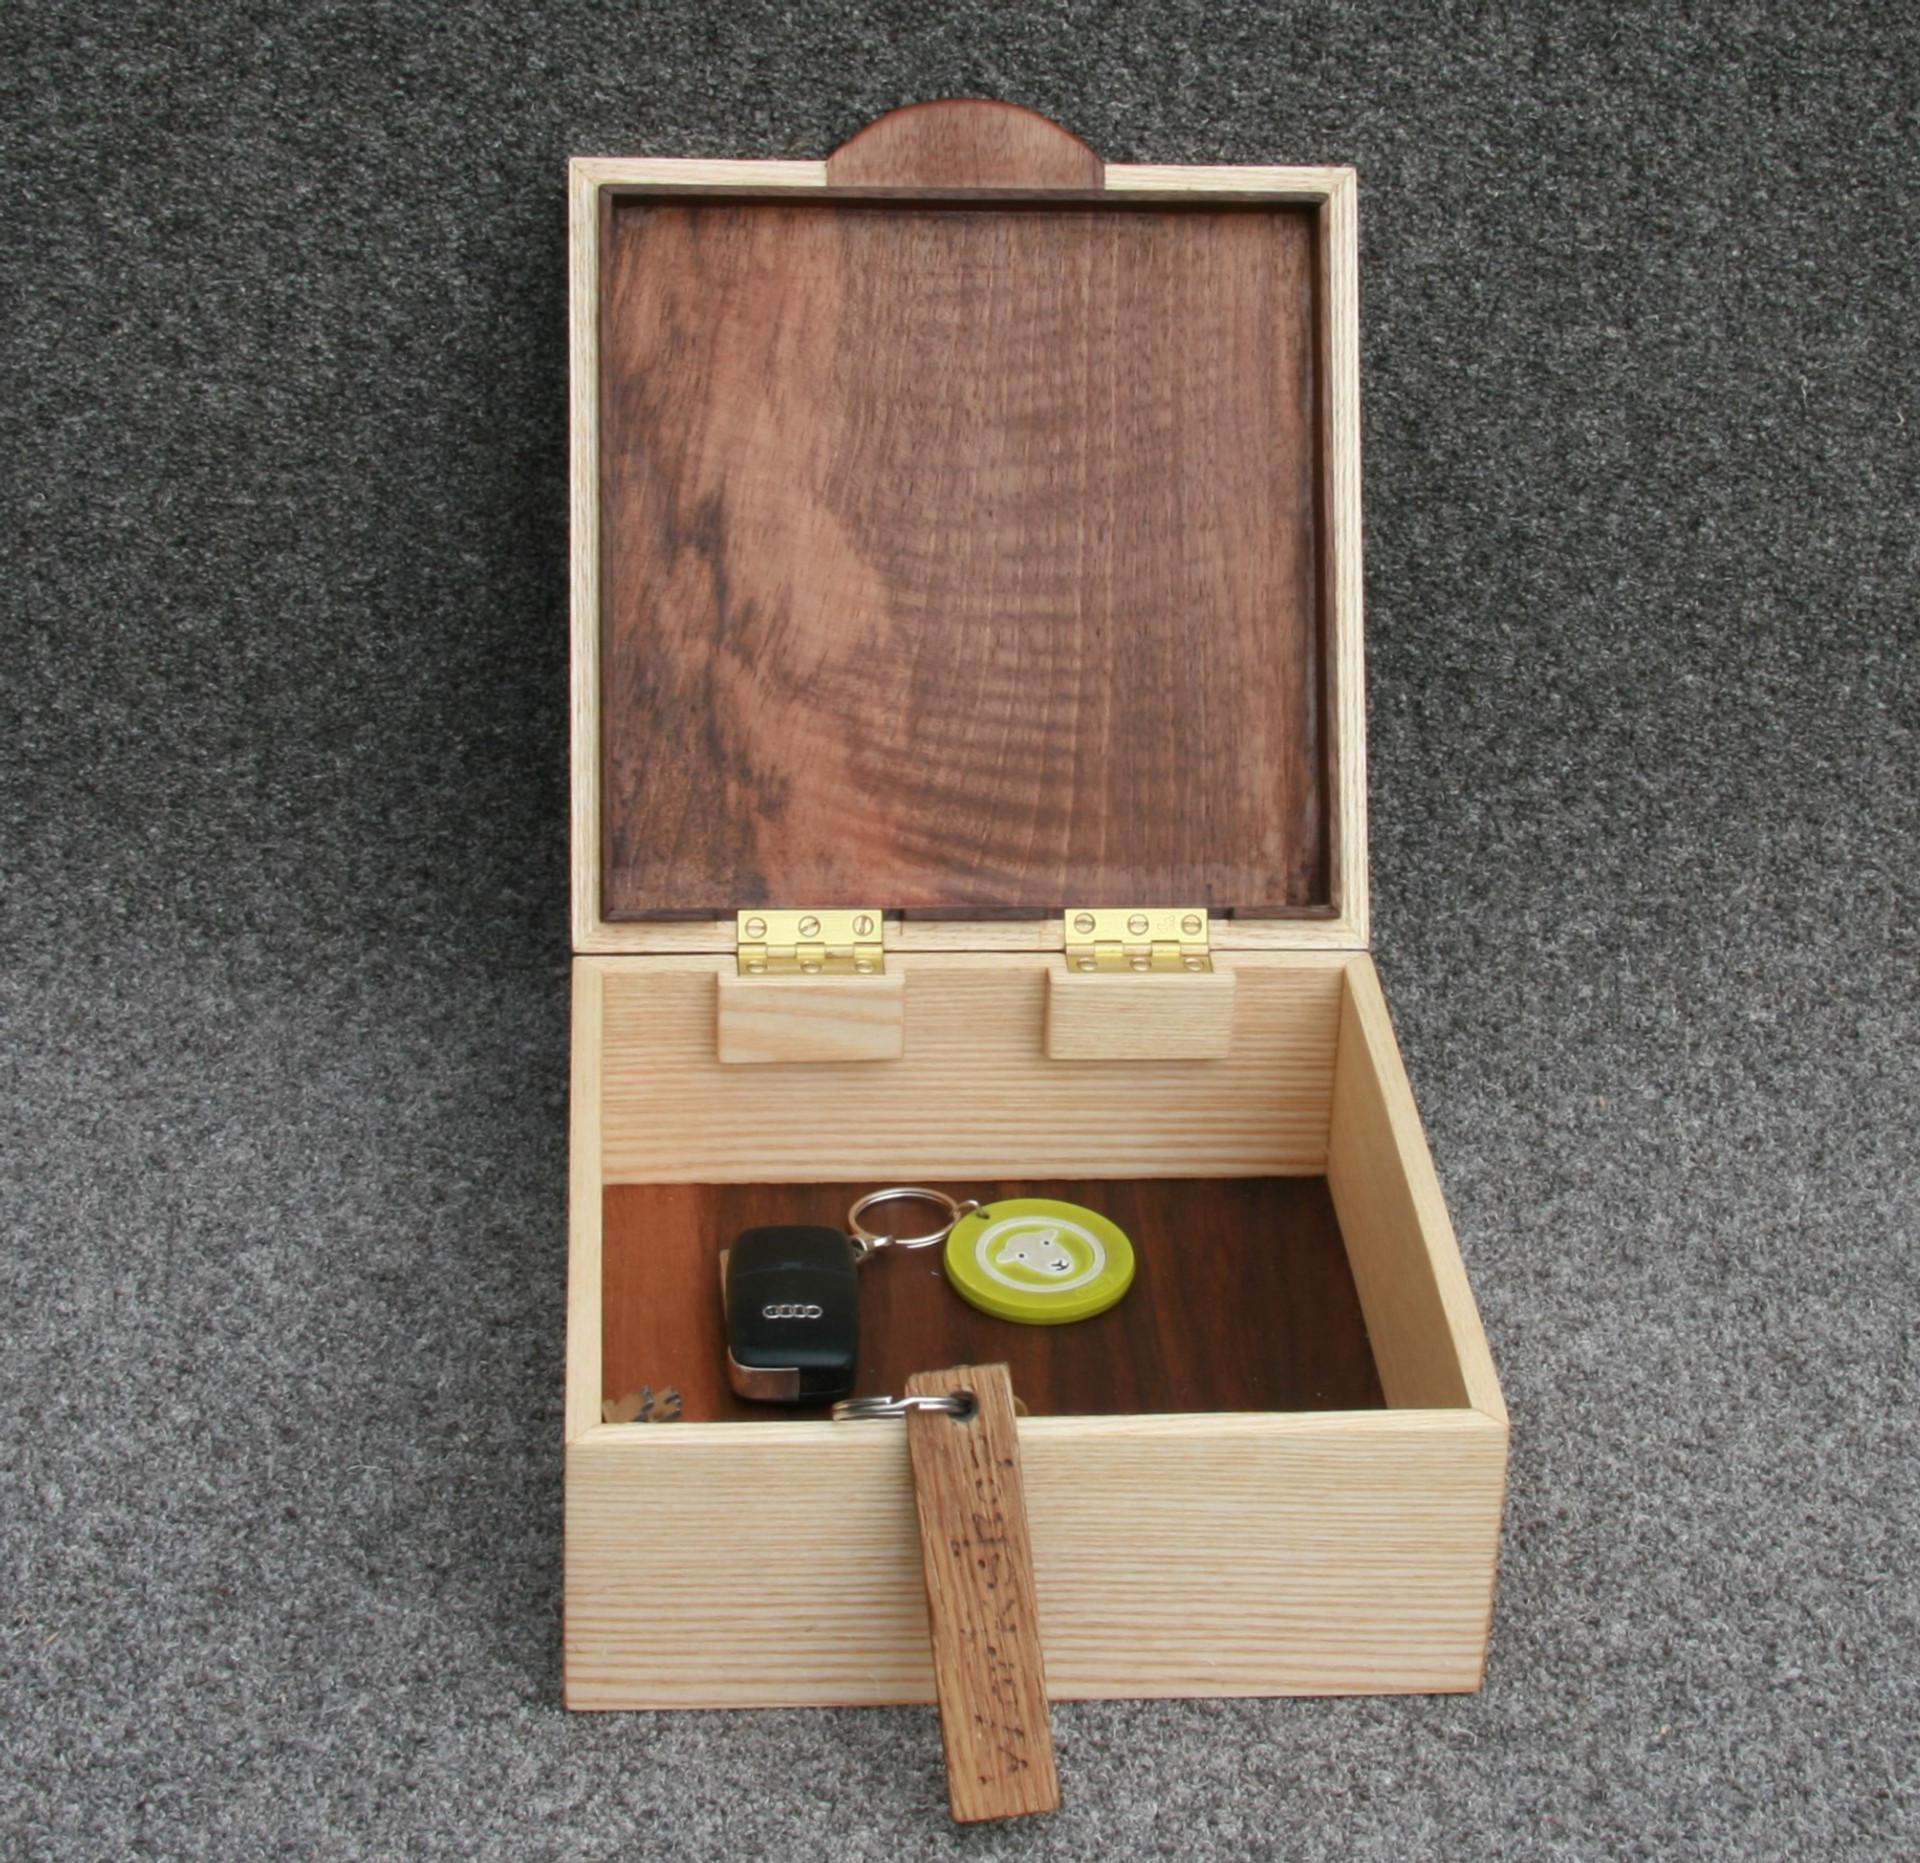 Walnut and Ash key box